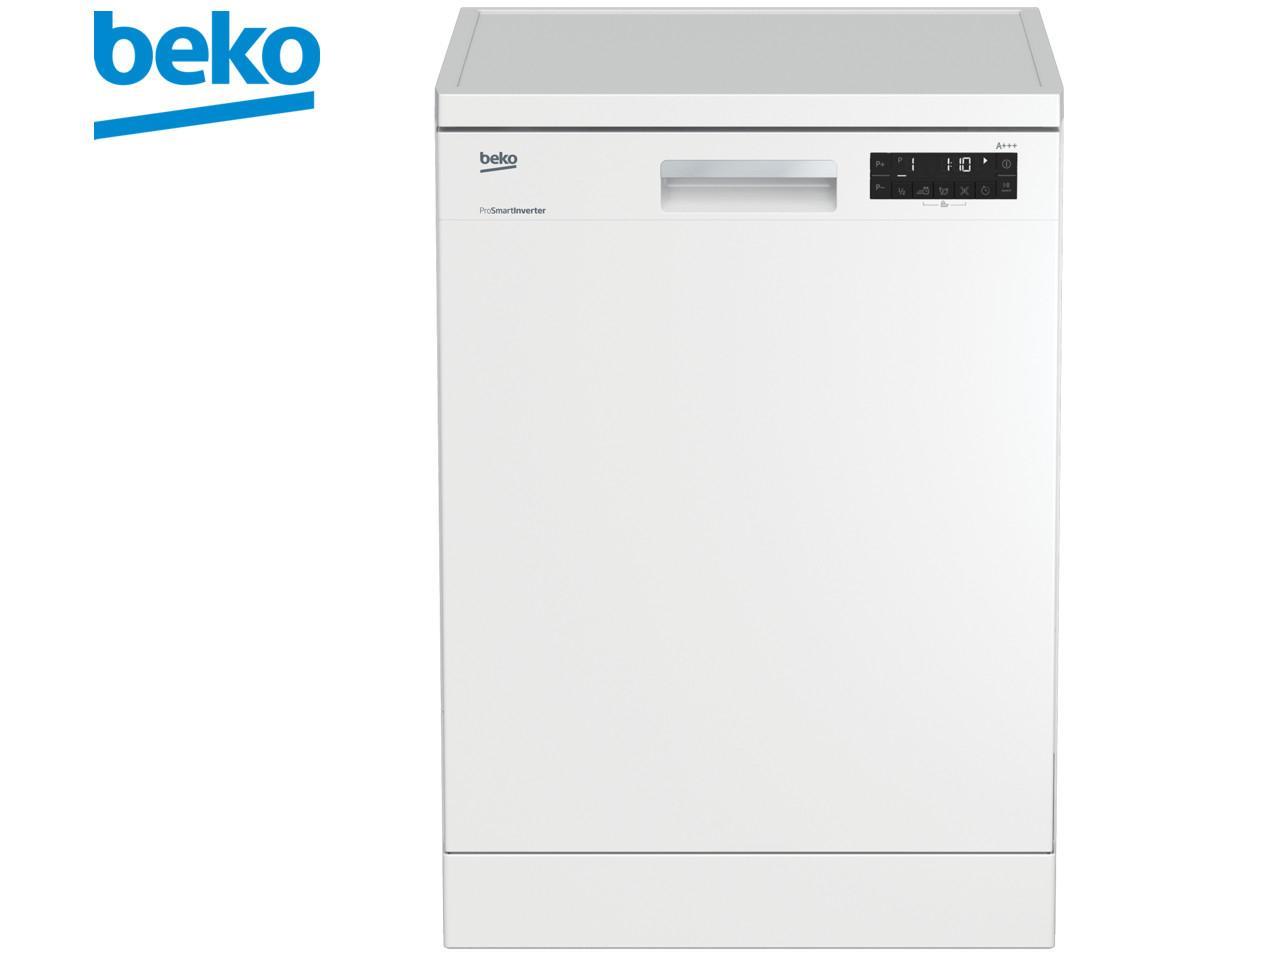 BEKO DFN 28430 W